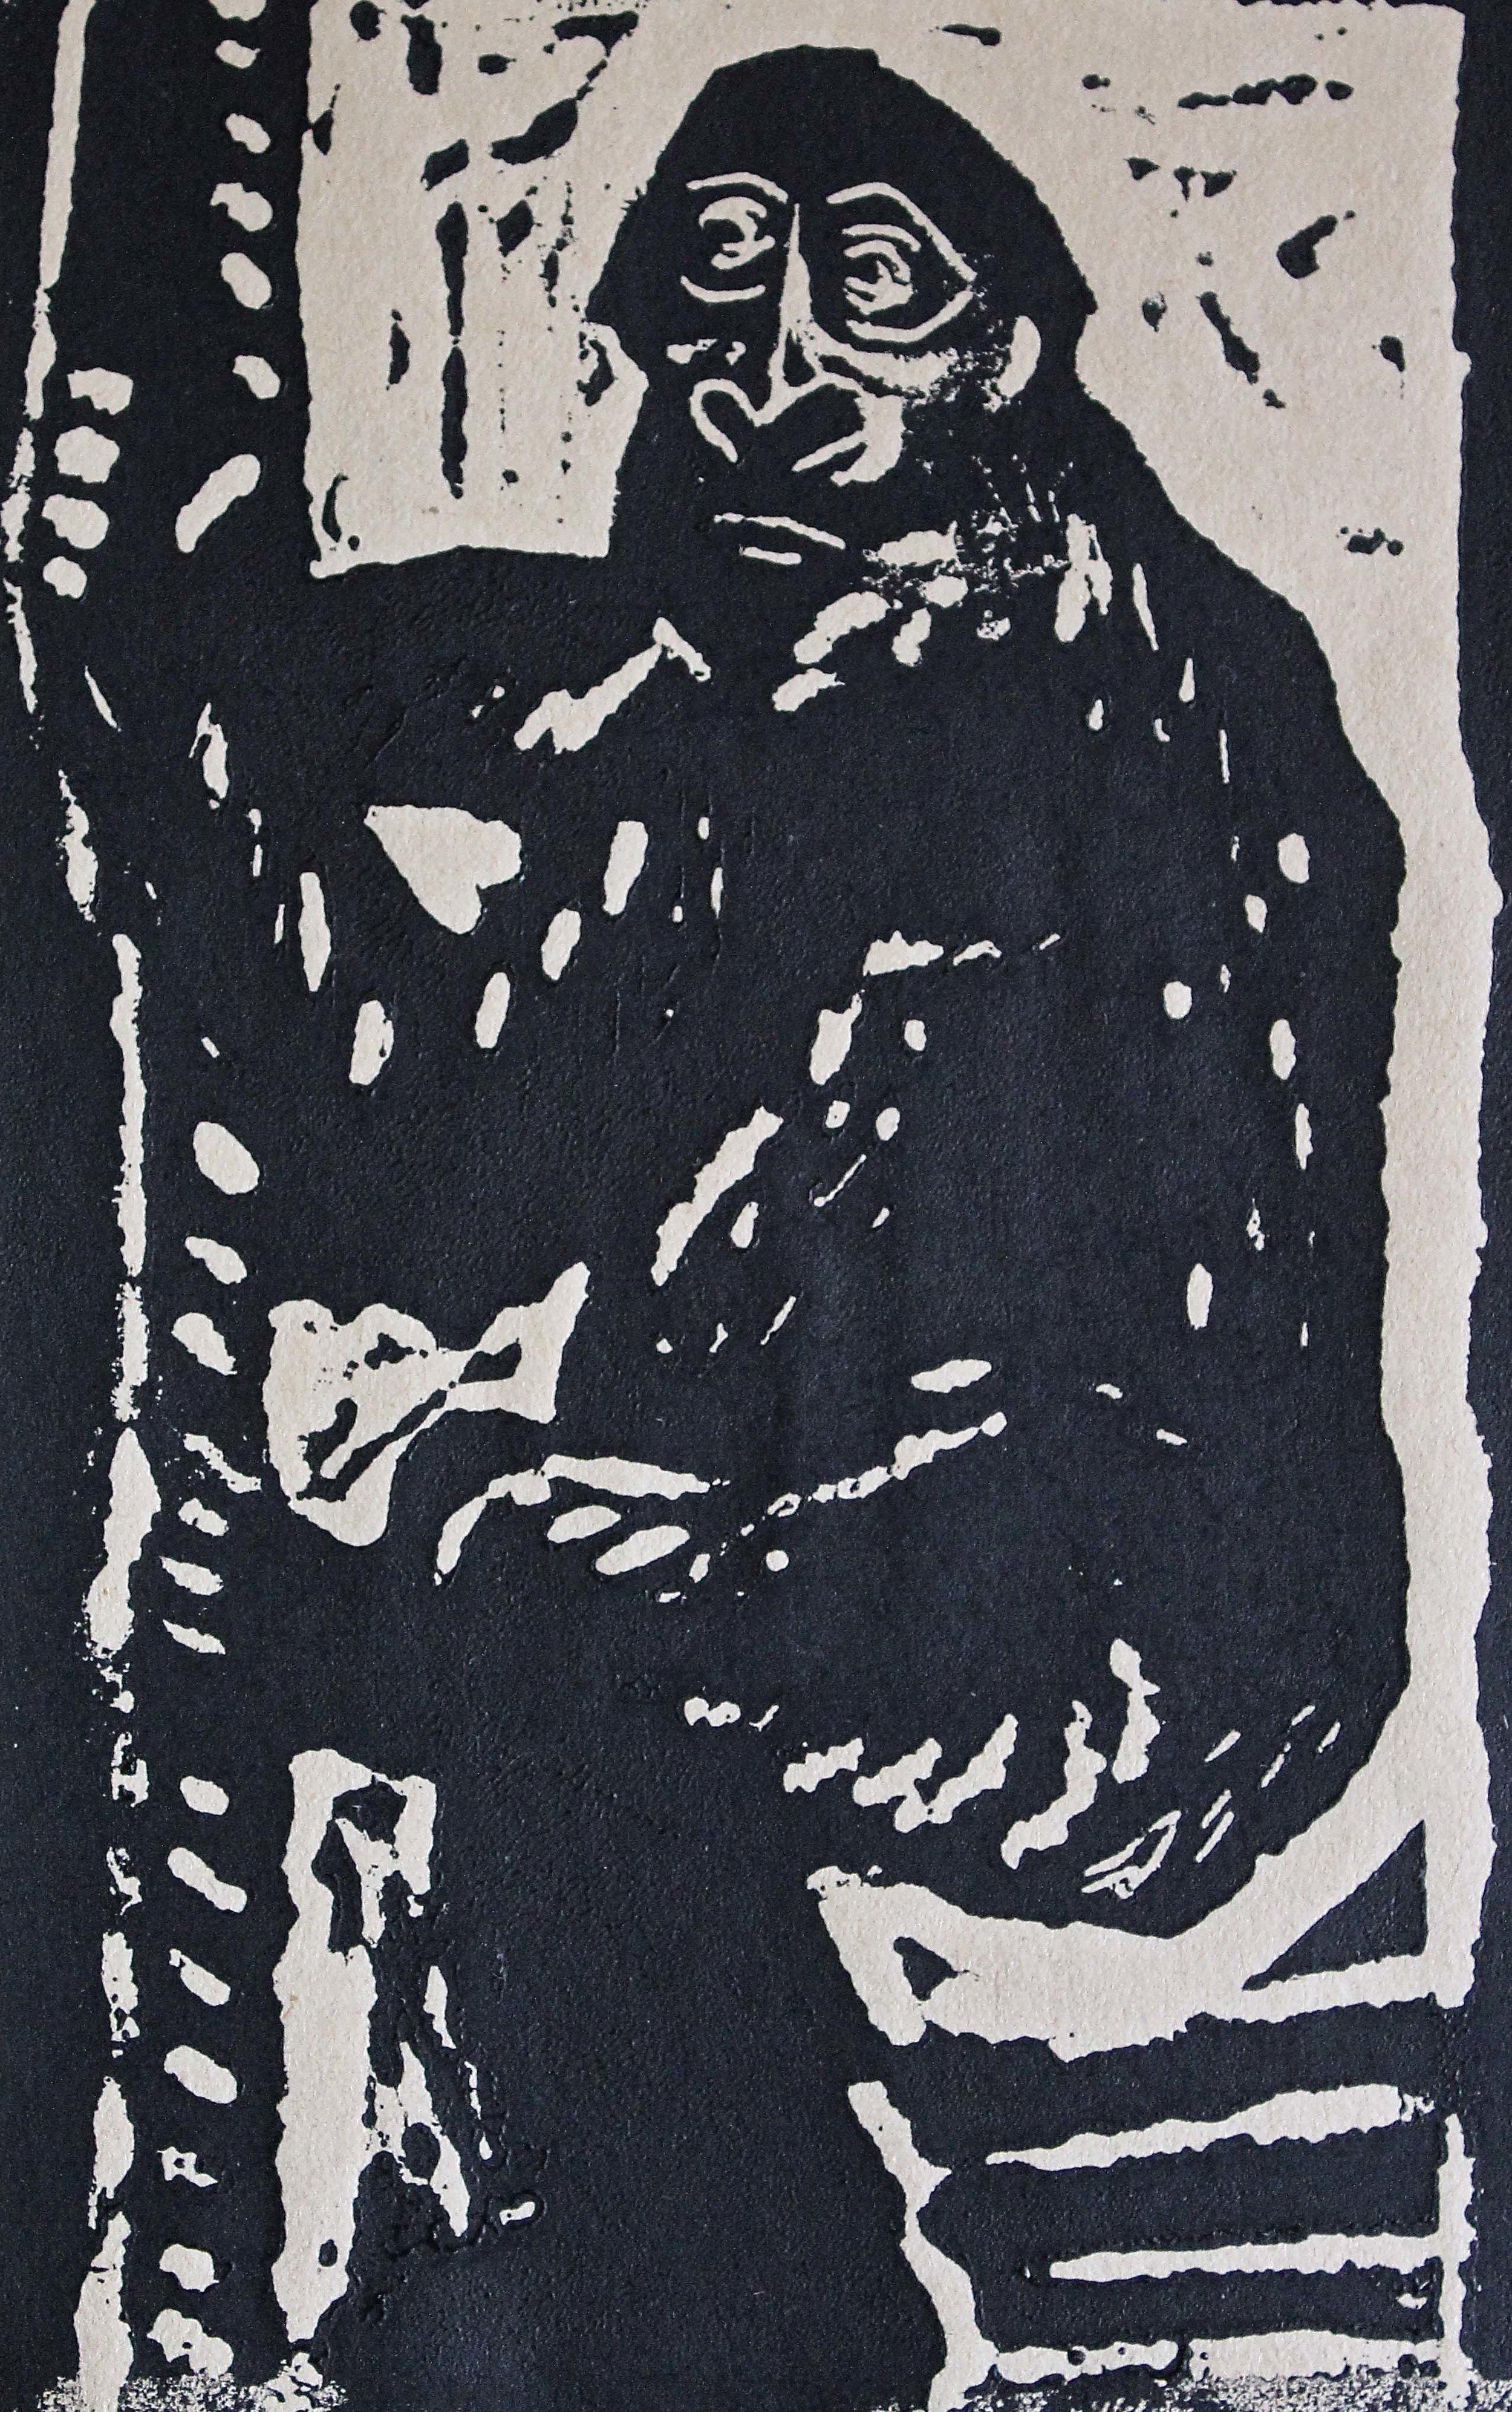 """Untitled"" (1/1) - ""Edwar El Kharrat Artist's Book Series"""